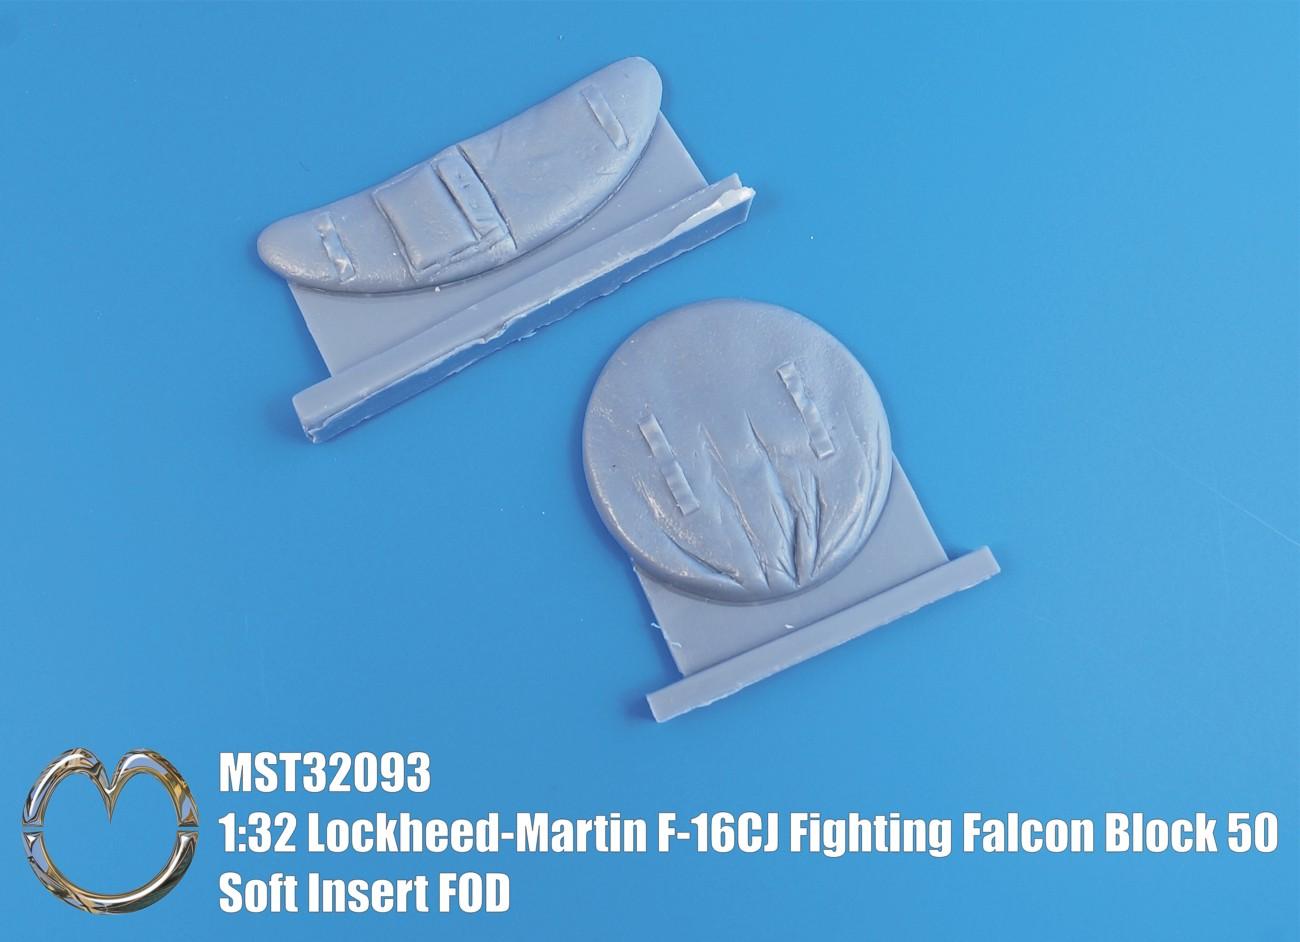 32093 Lockheed-Martin F-16CJ Fighting Falcon Block 50 FOD